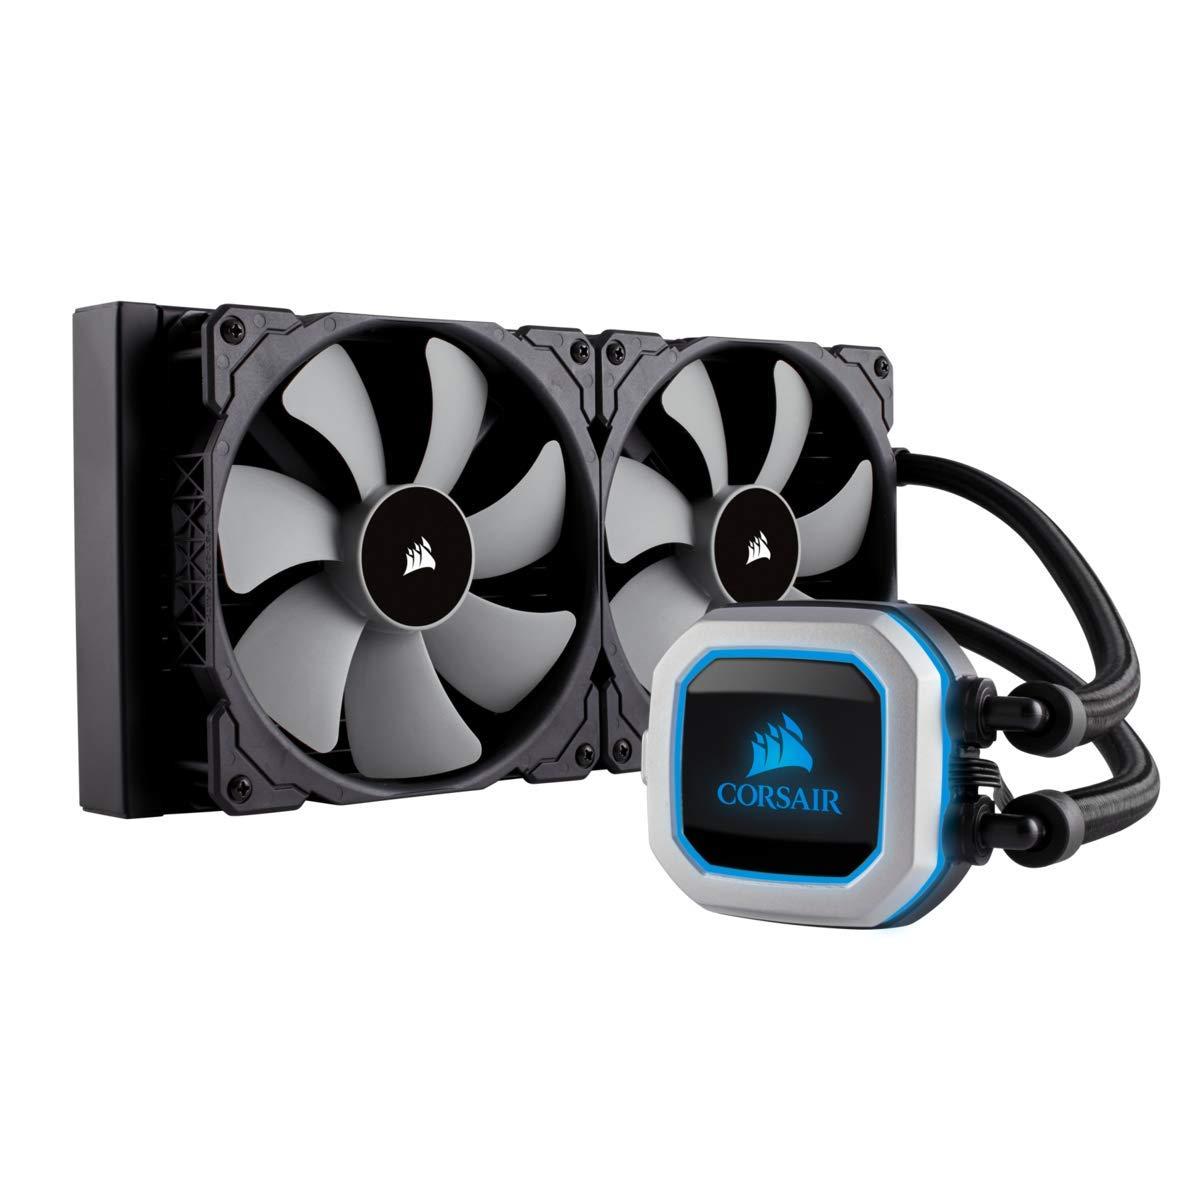 Corsair H115i PRO RGB Water Cooling (280mm) CLC Kit - £100 @ Amazon